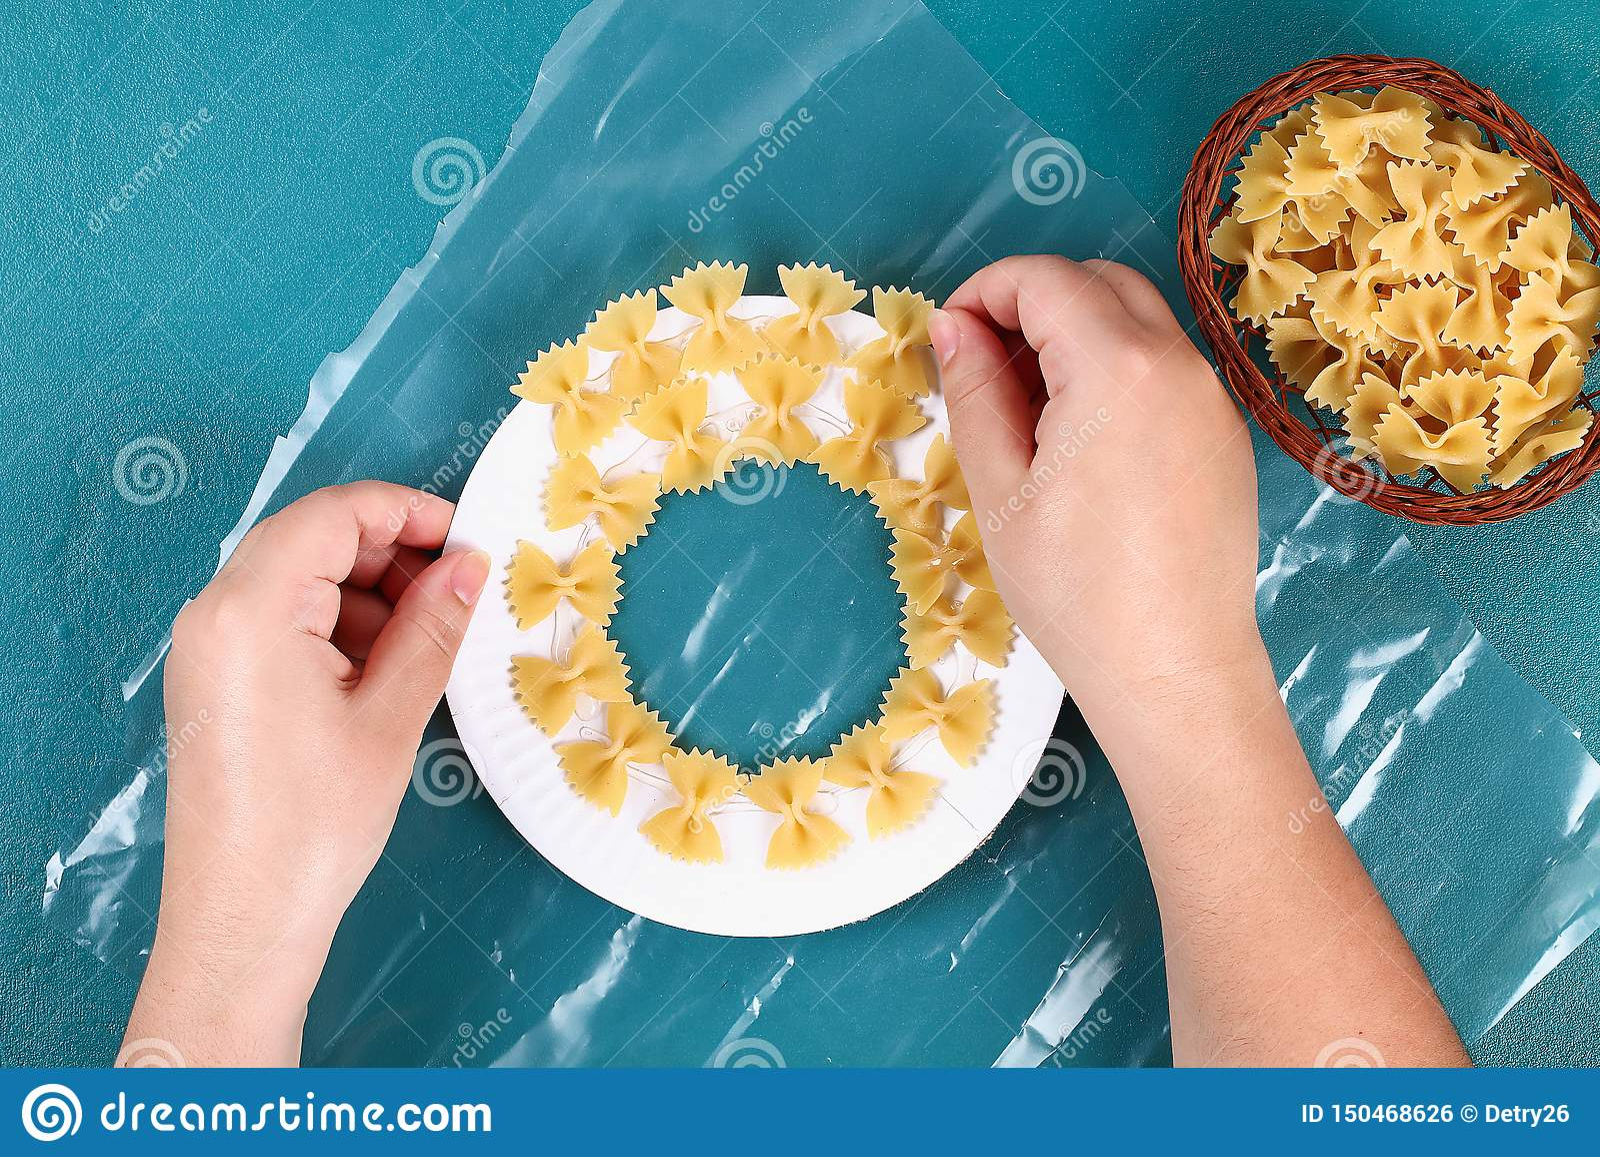 Diy Christmas pasta wreath on blue background. Gift idea, decor Christmas, Xmas, New Year